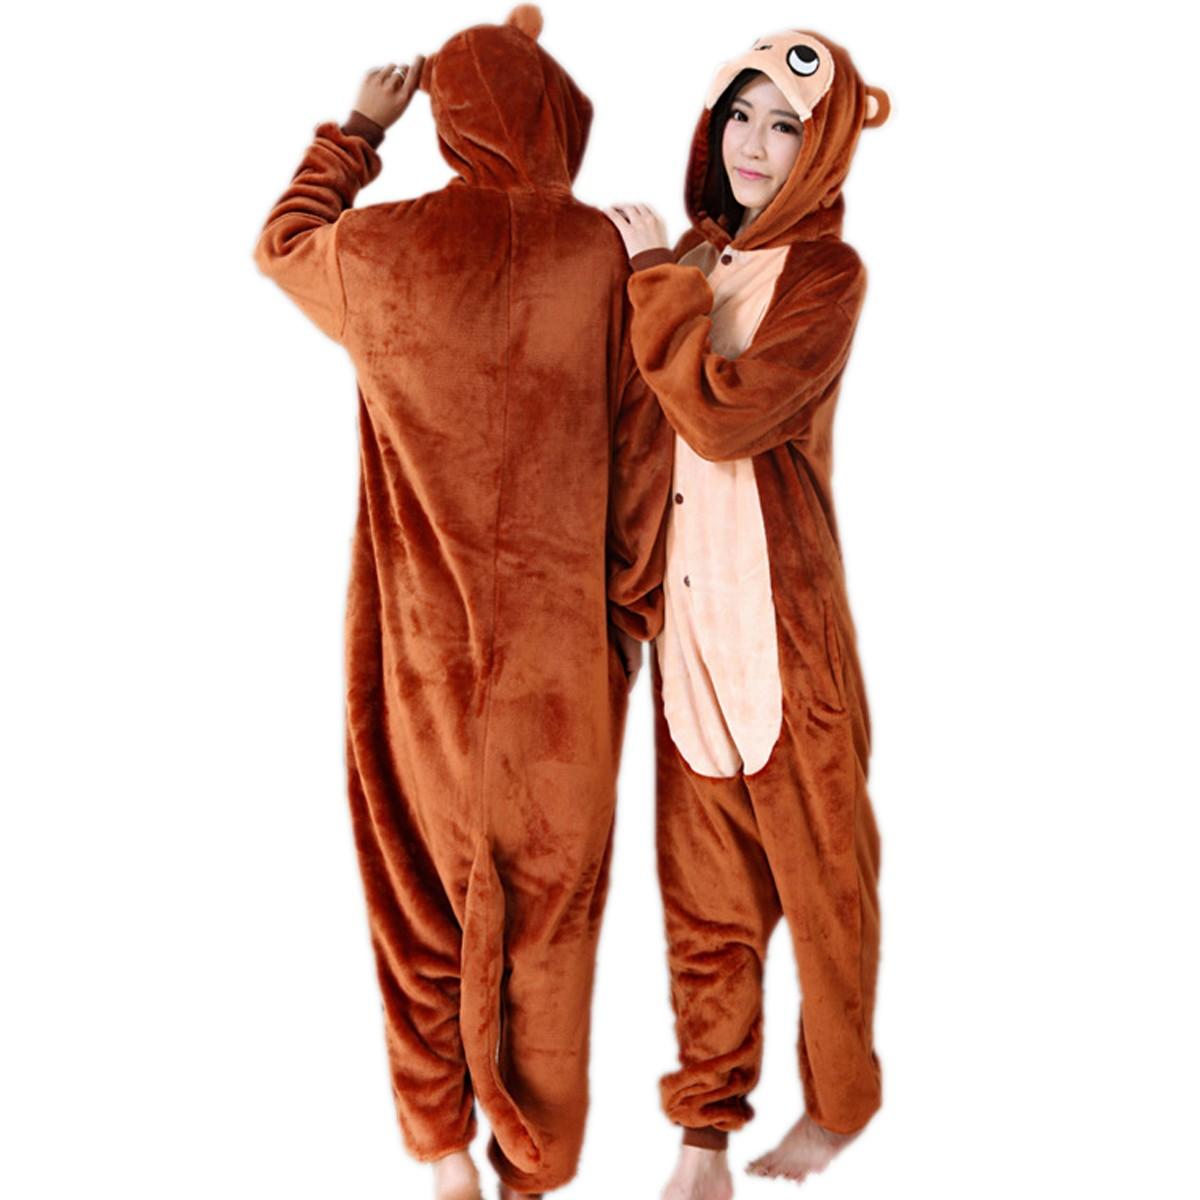 c36d6210fe Brown Monkey Onesie Unisex Women   Men Animal Kigurumi Pajama Party Costumes